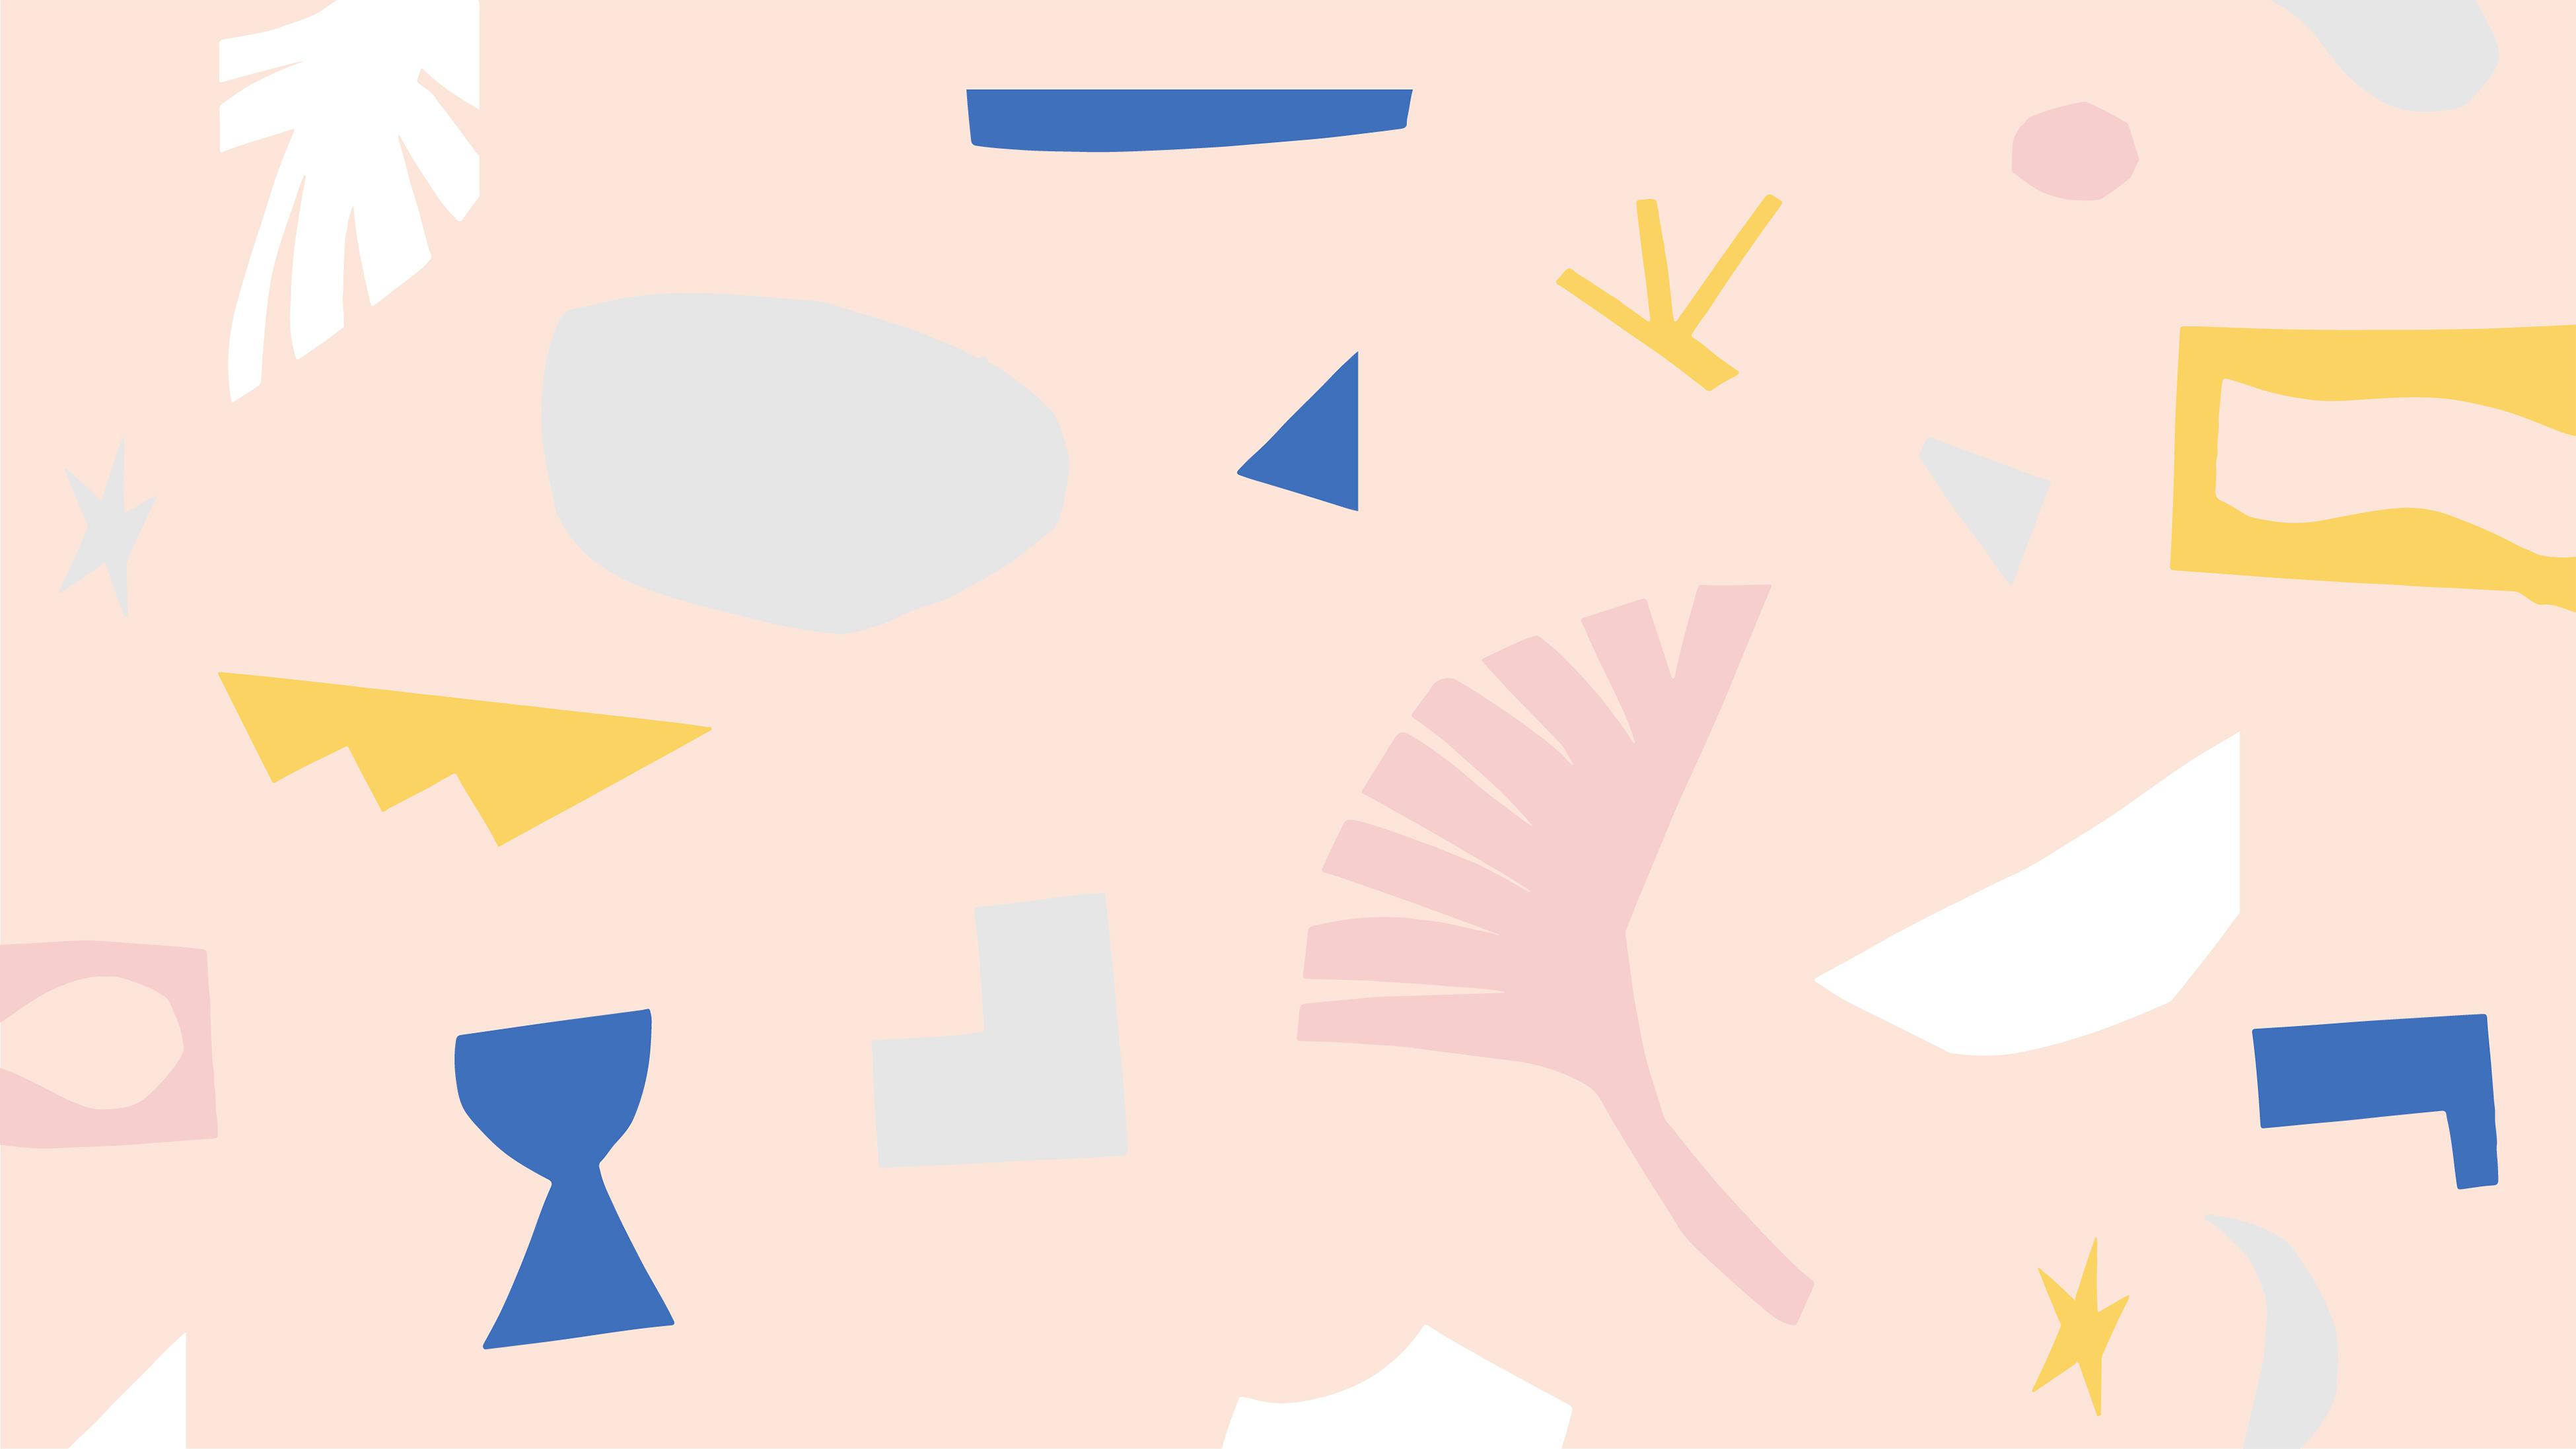 Cutout Shapes